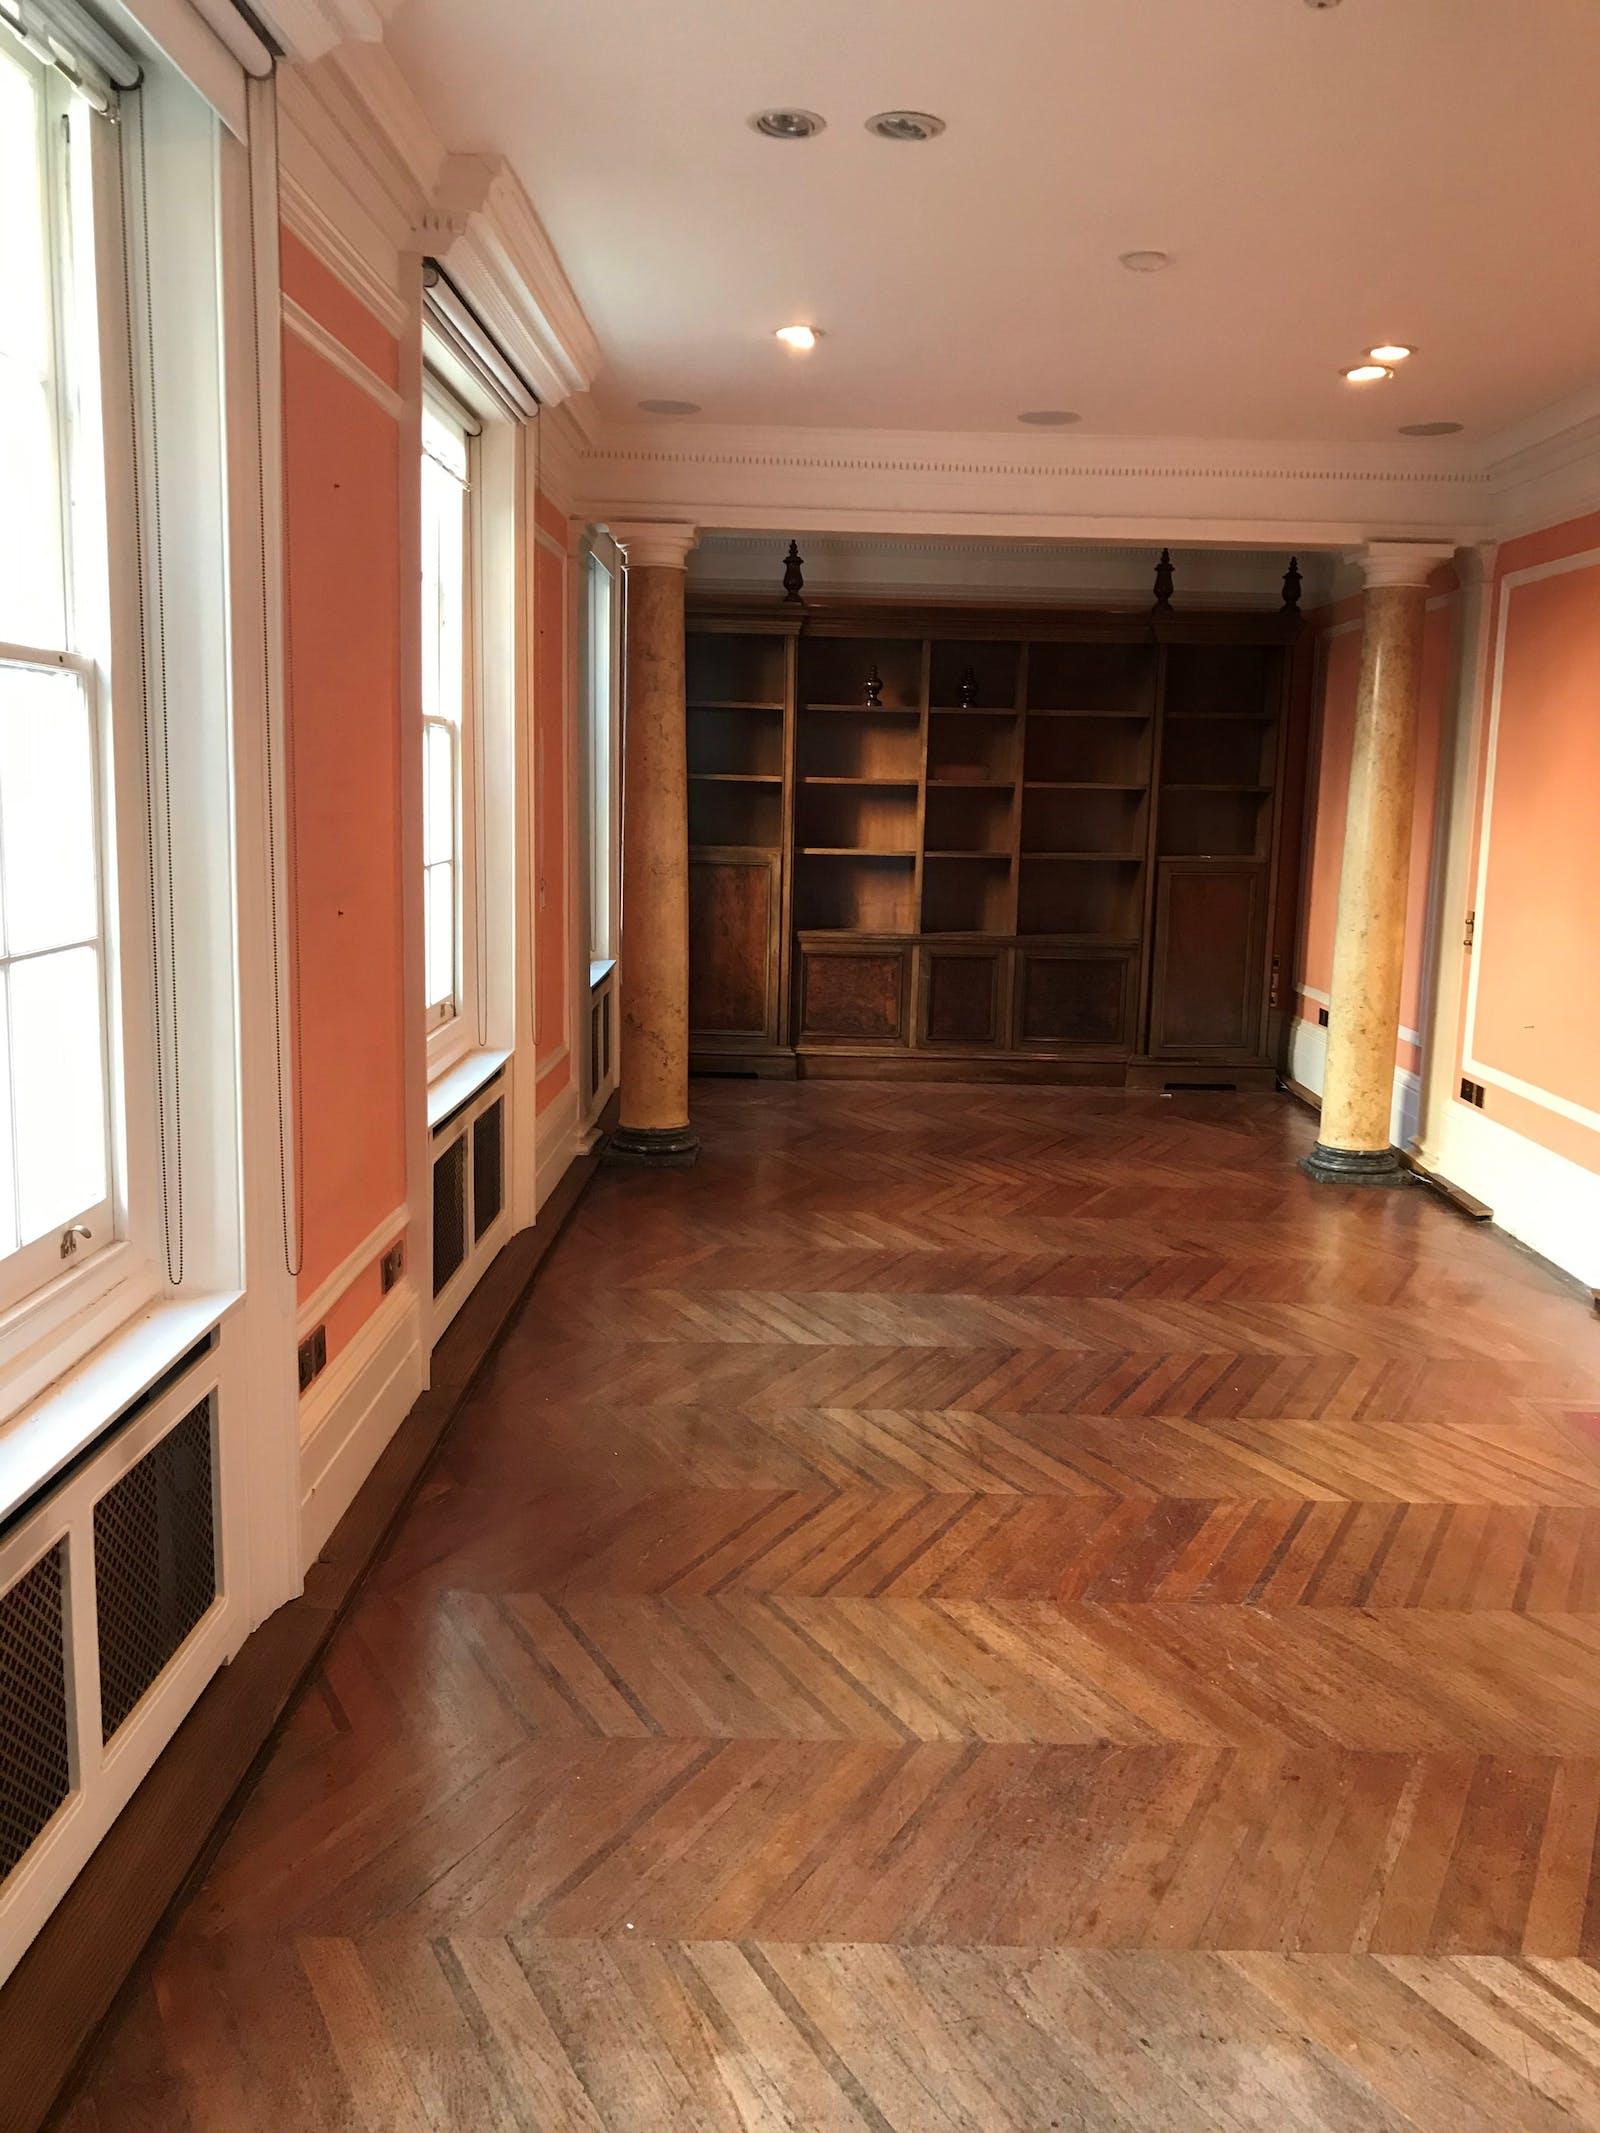 19 West Eaton Place, Belgravia, London, Office To Let - ground floor.jpg